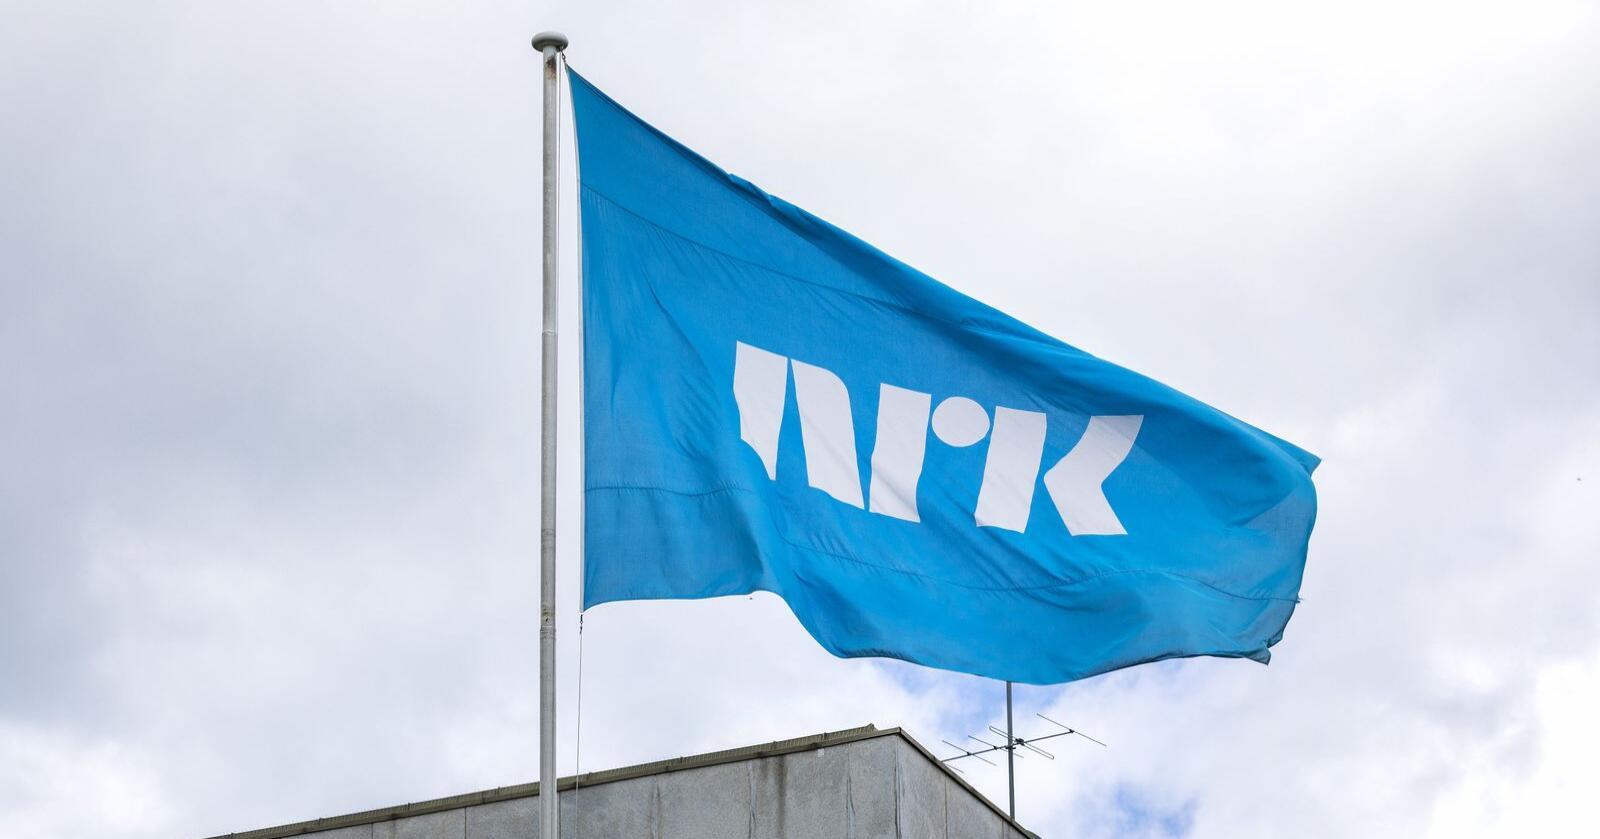 Illustrasjonsfoto: Gorm Kallestad / NTB scanpix / NPK